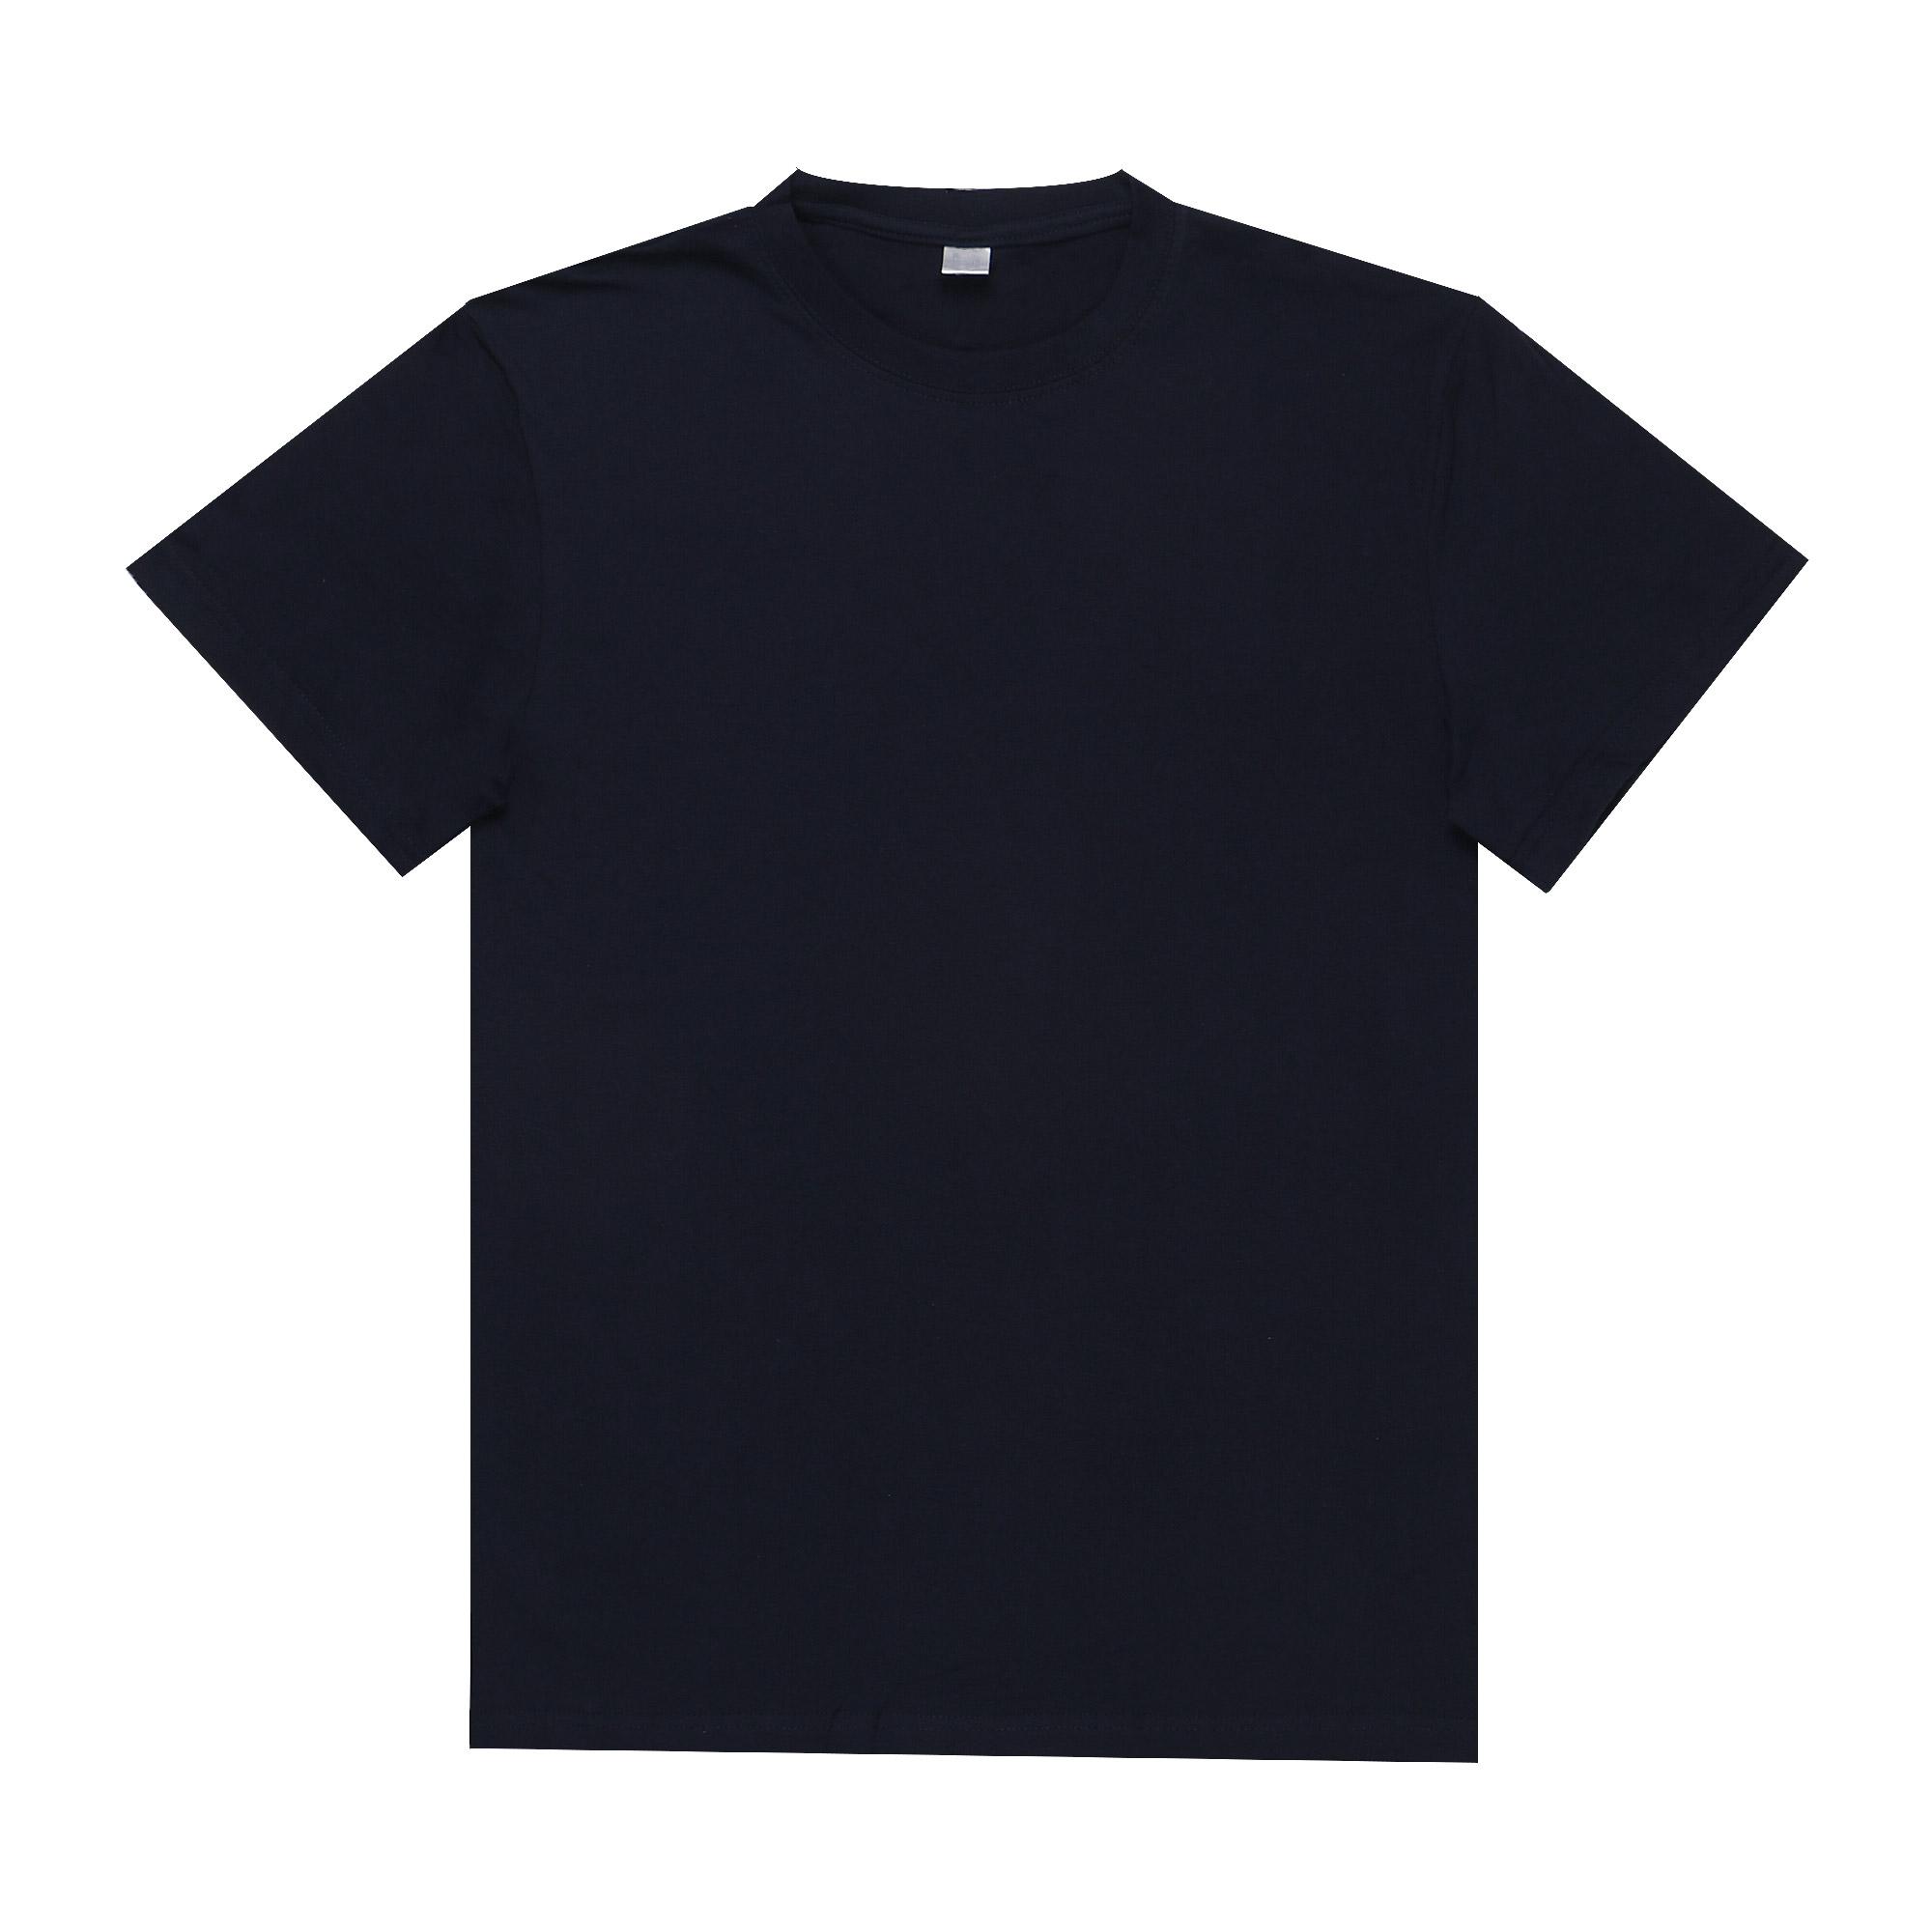 Футболка мужская M-1 Promo темно-синяя с коротким рукавом M